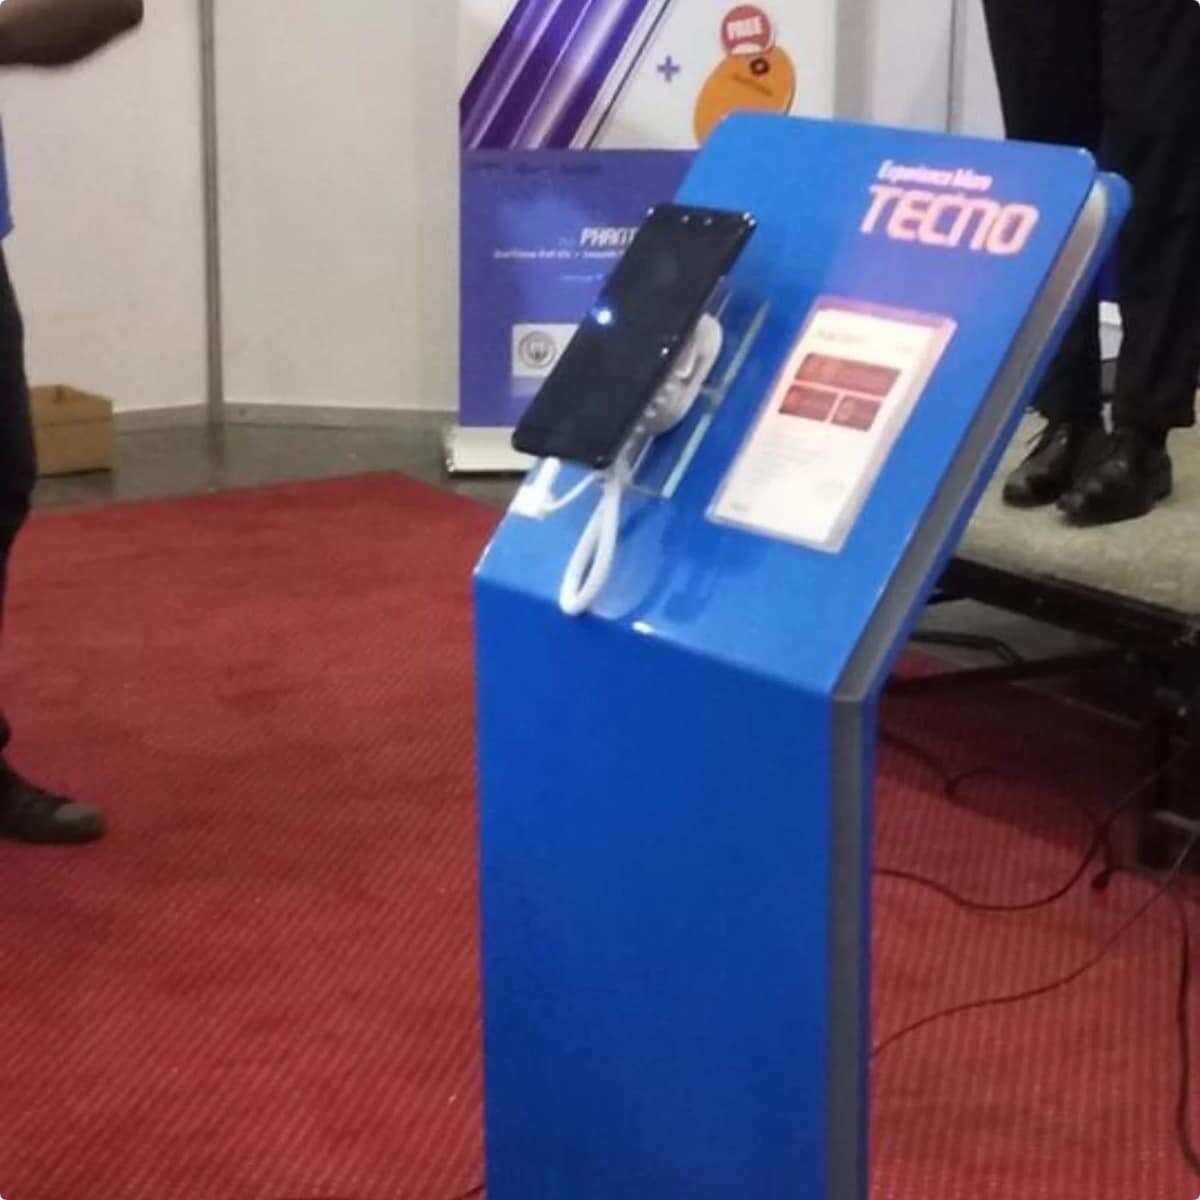 Tecno Mobile Ghana launches new Phantom 8